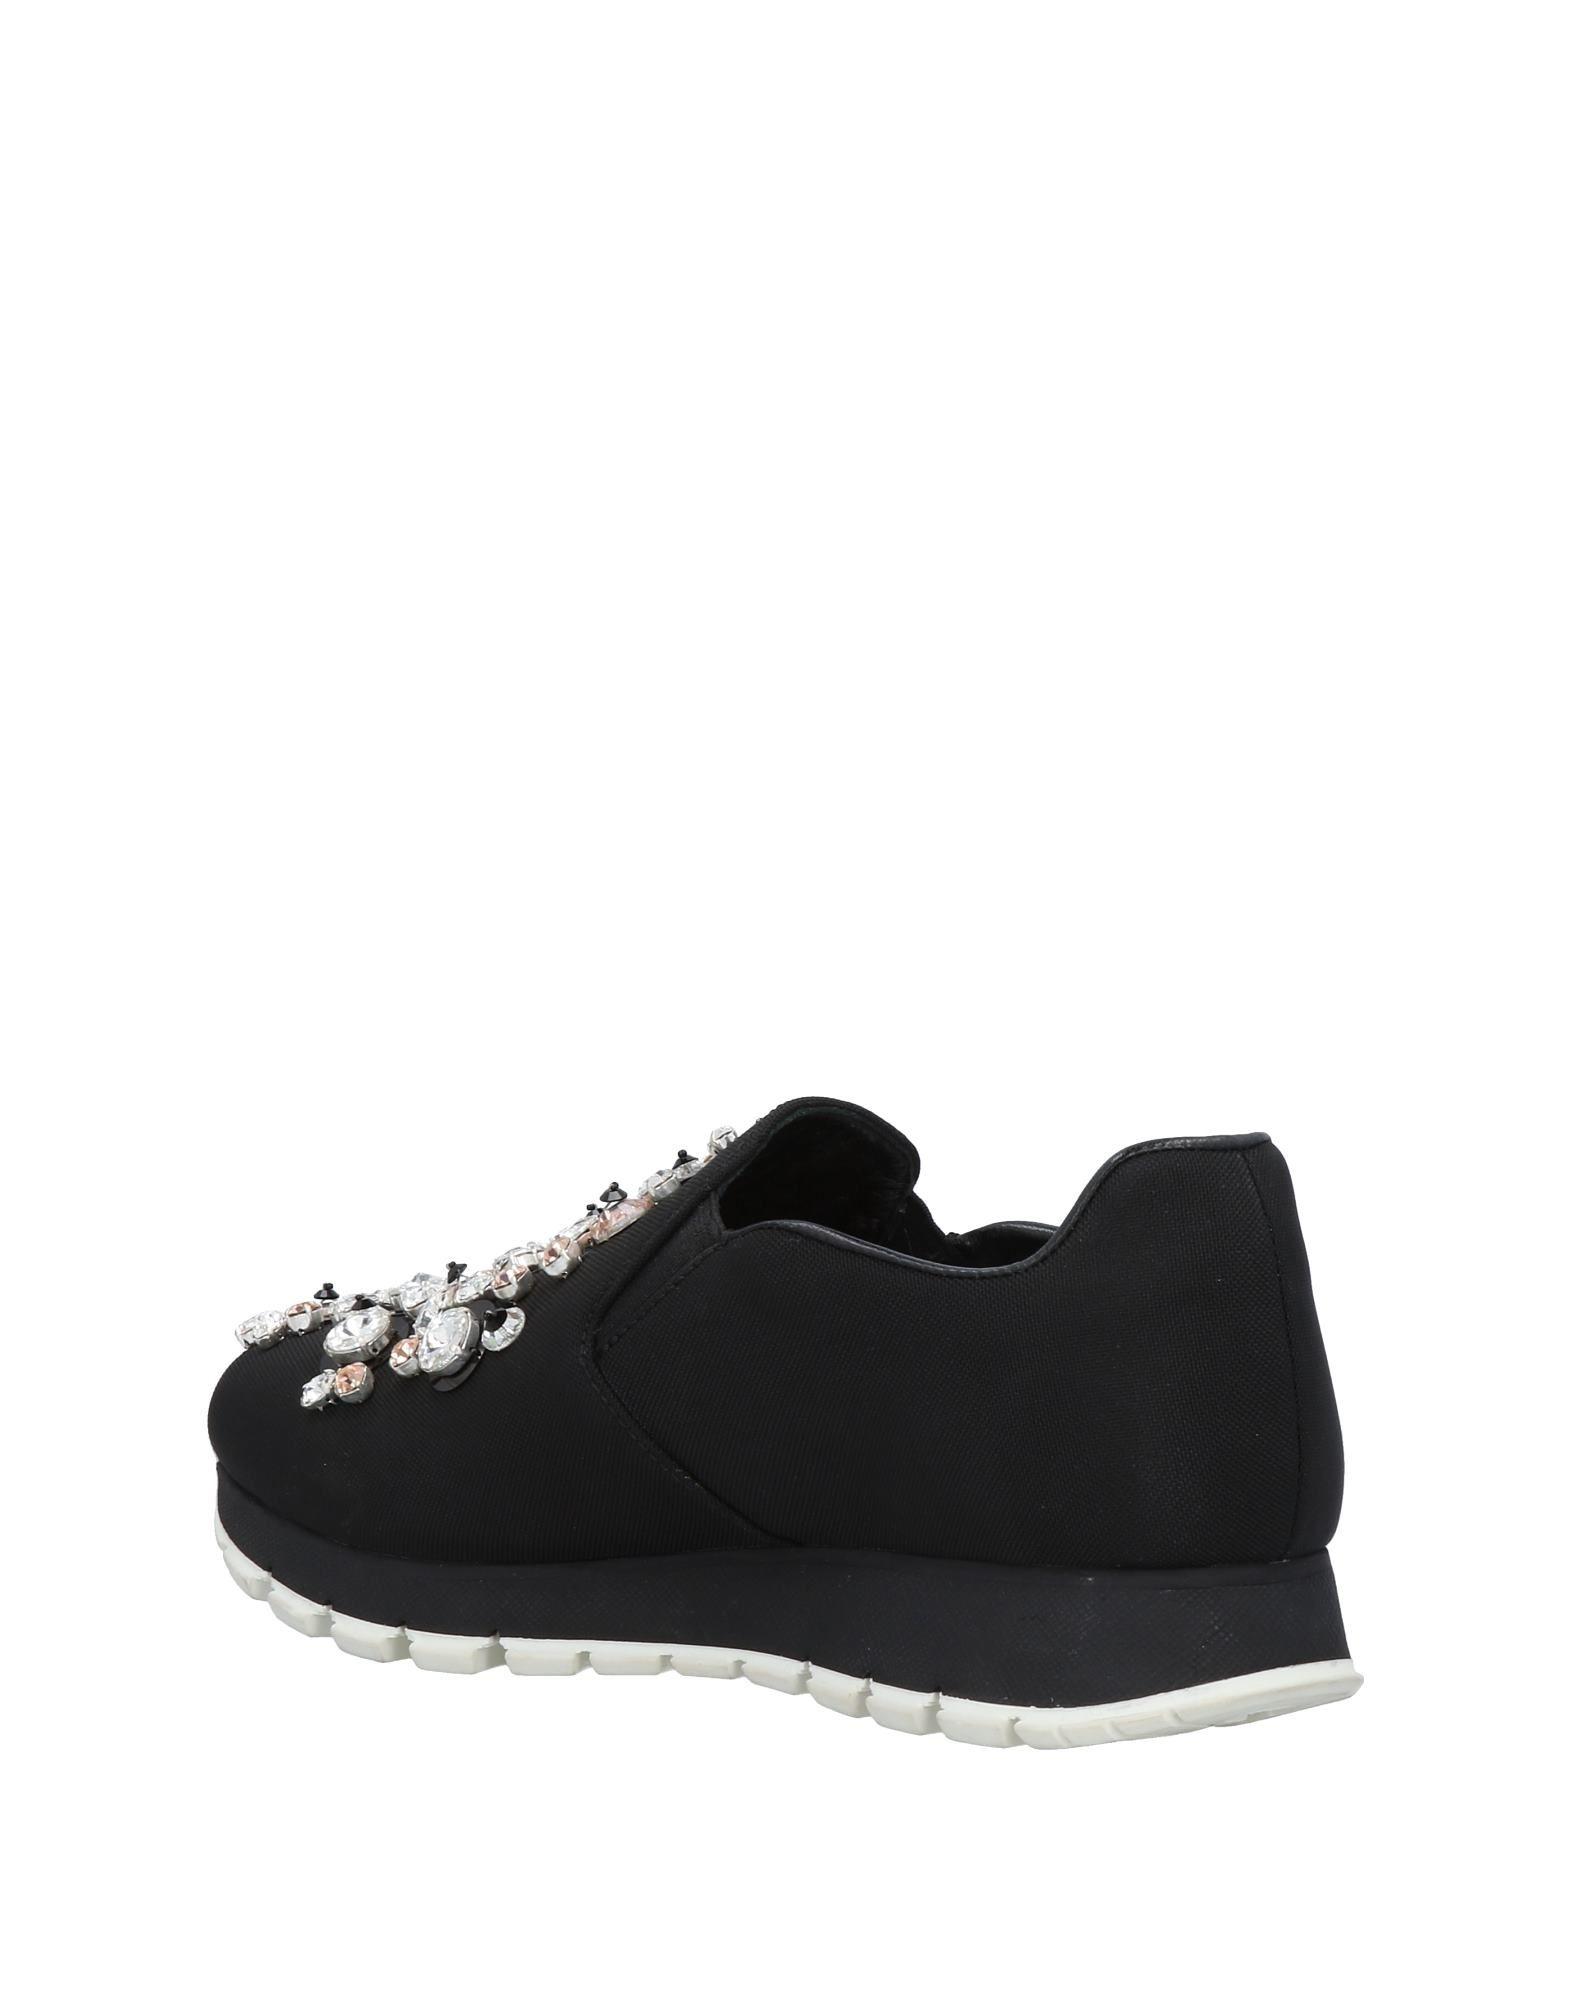 Prada Sneakers Damen  11487964NAGünstige Schuhe gut aussehende Schuhe 11487964NAGünstige f1a839